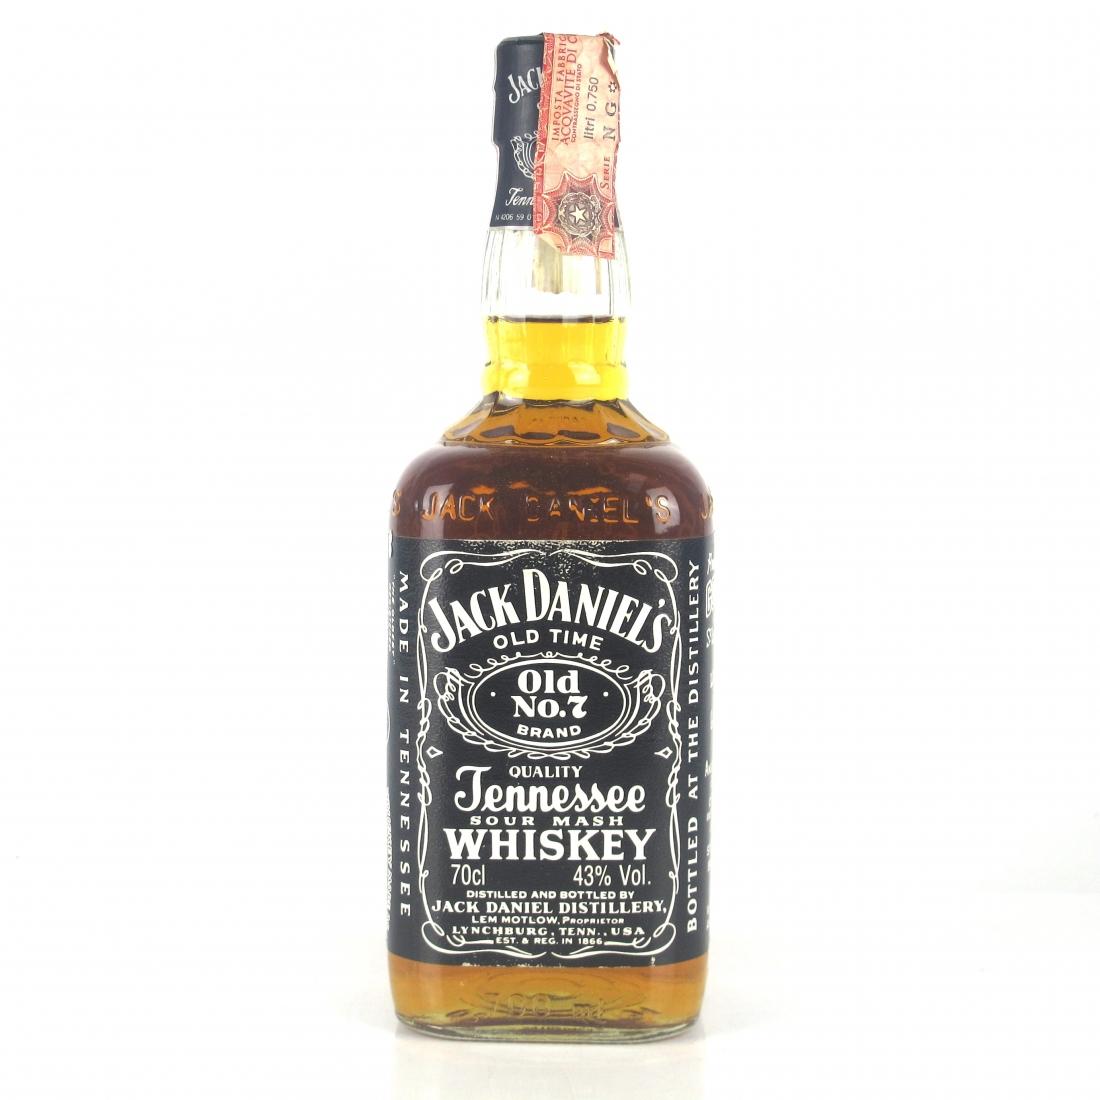 Jack Daniel's Old No. 7 / Pre-2003